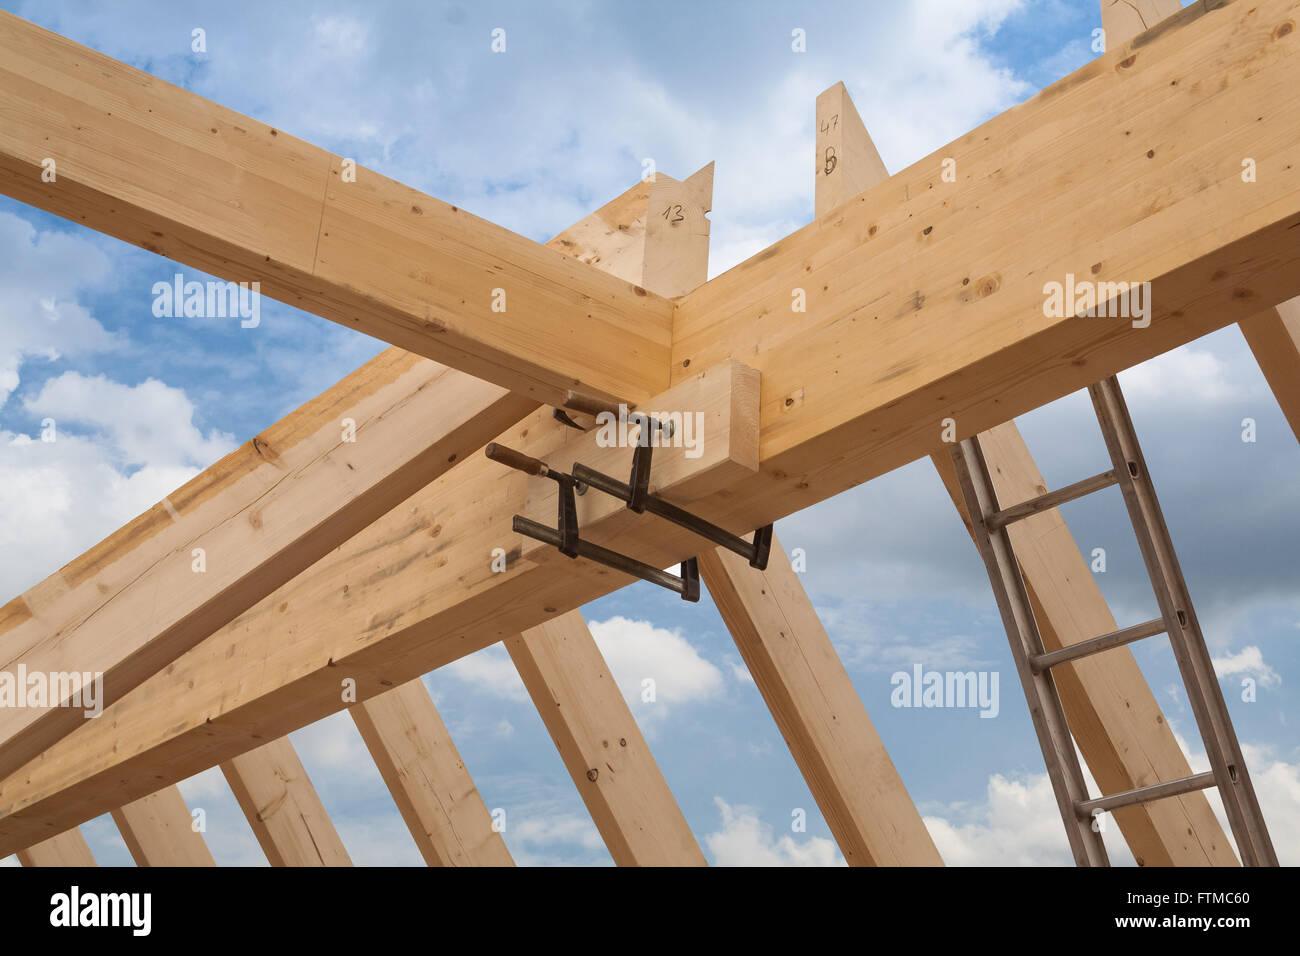 Techo de madera Imagen De Stock